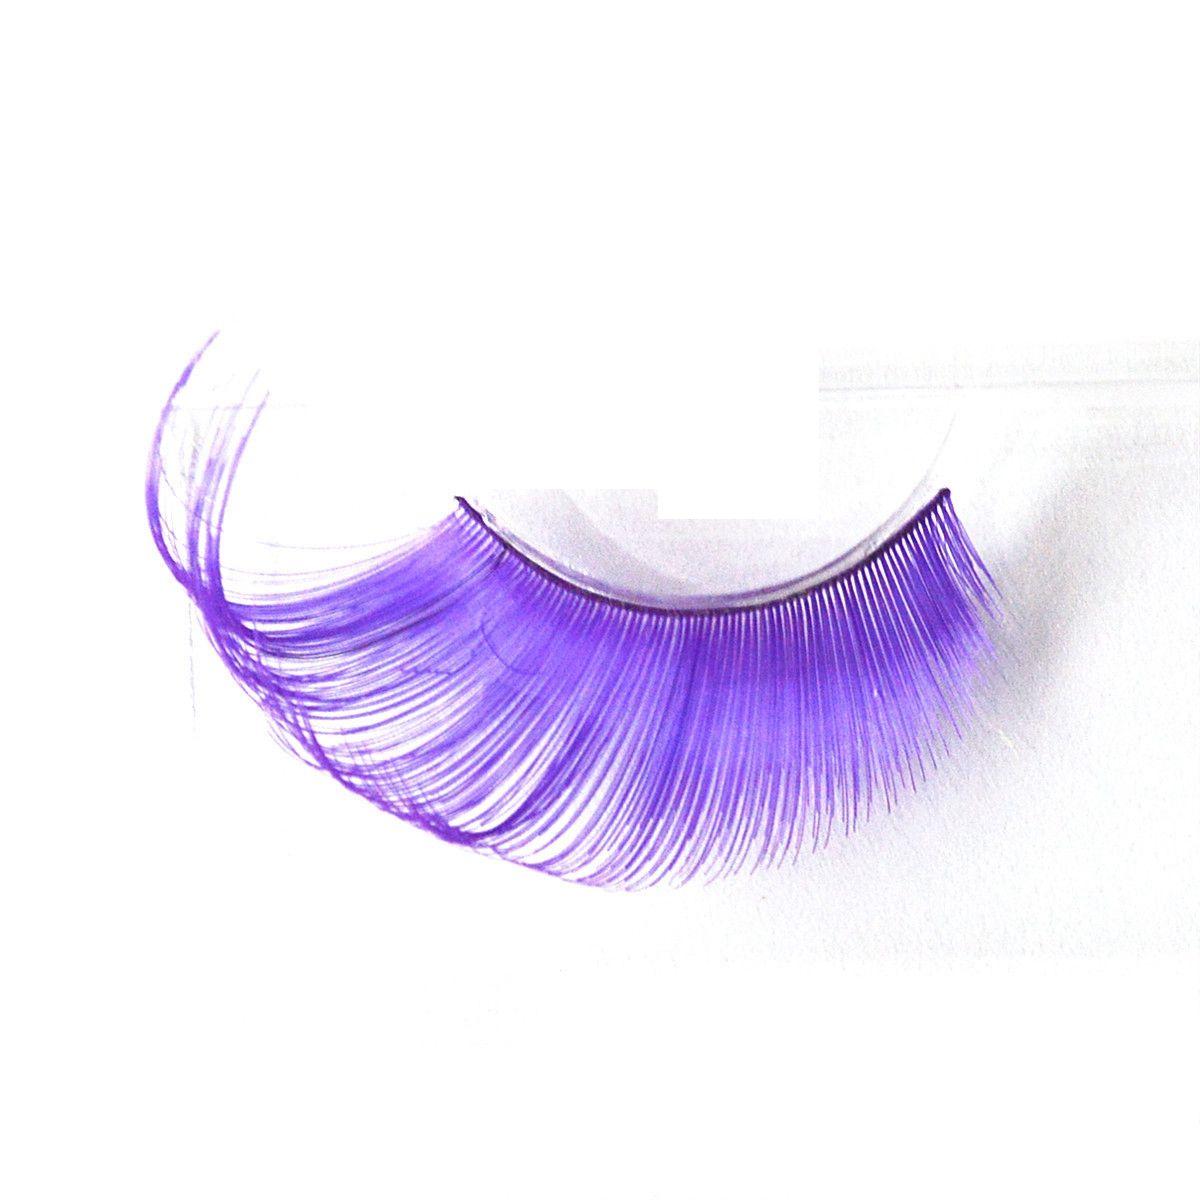 ce76264b640 False Eyelashes Handmade Purple Green Fake Lashes For Stage Festival  Colorful Long False Eyelashes Eye Makeup Beauty Tools GGA1760 Eyelash  Extensions Makeup ...